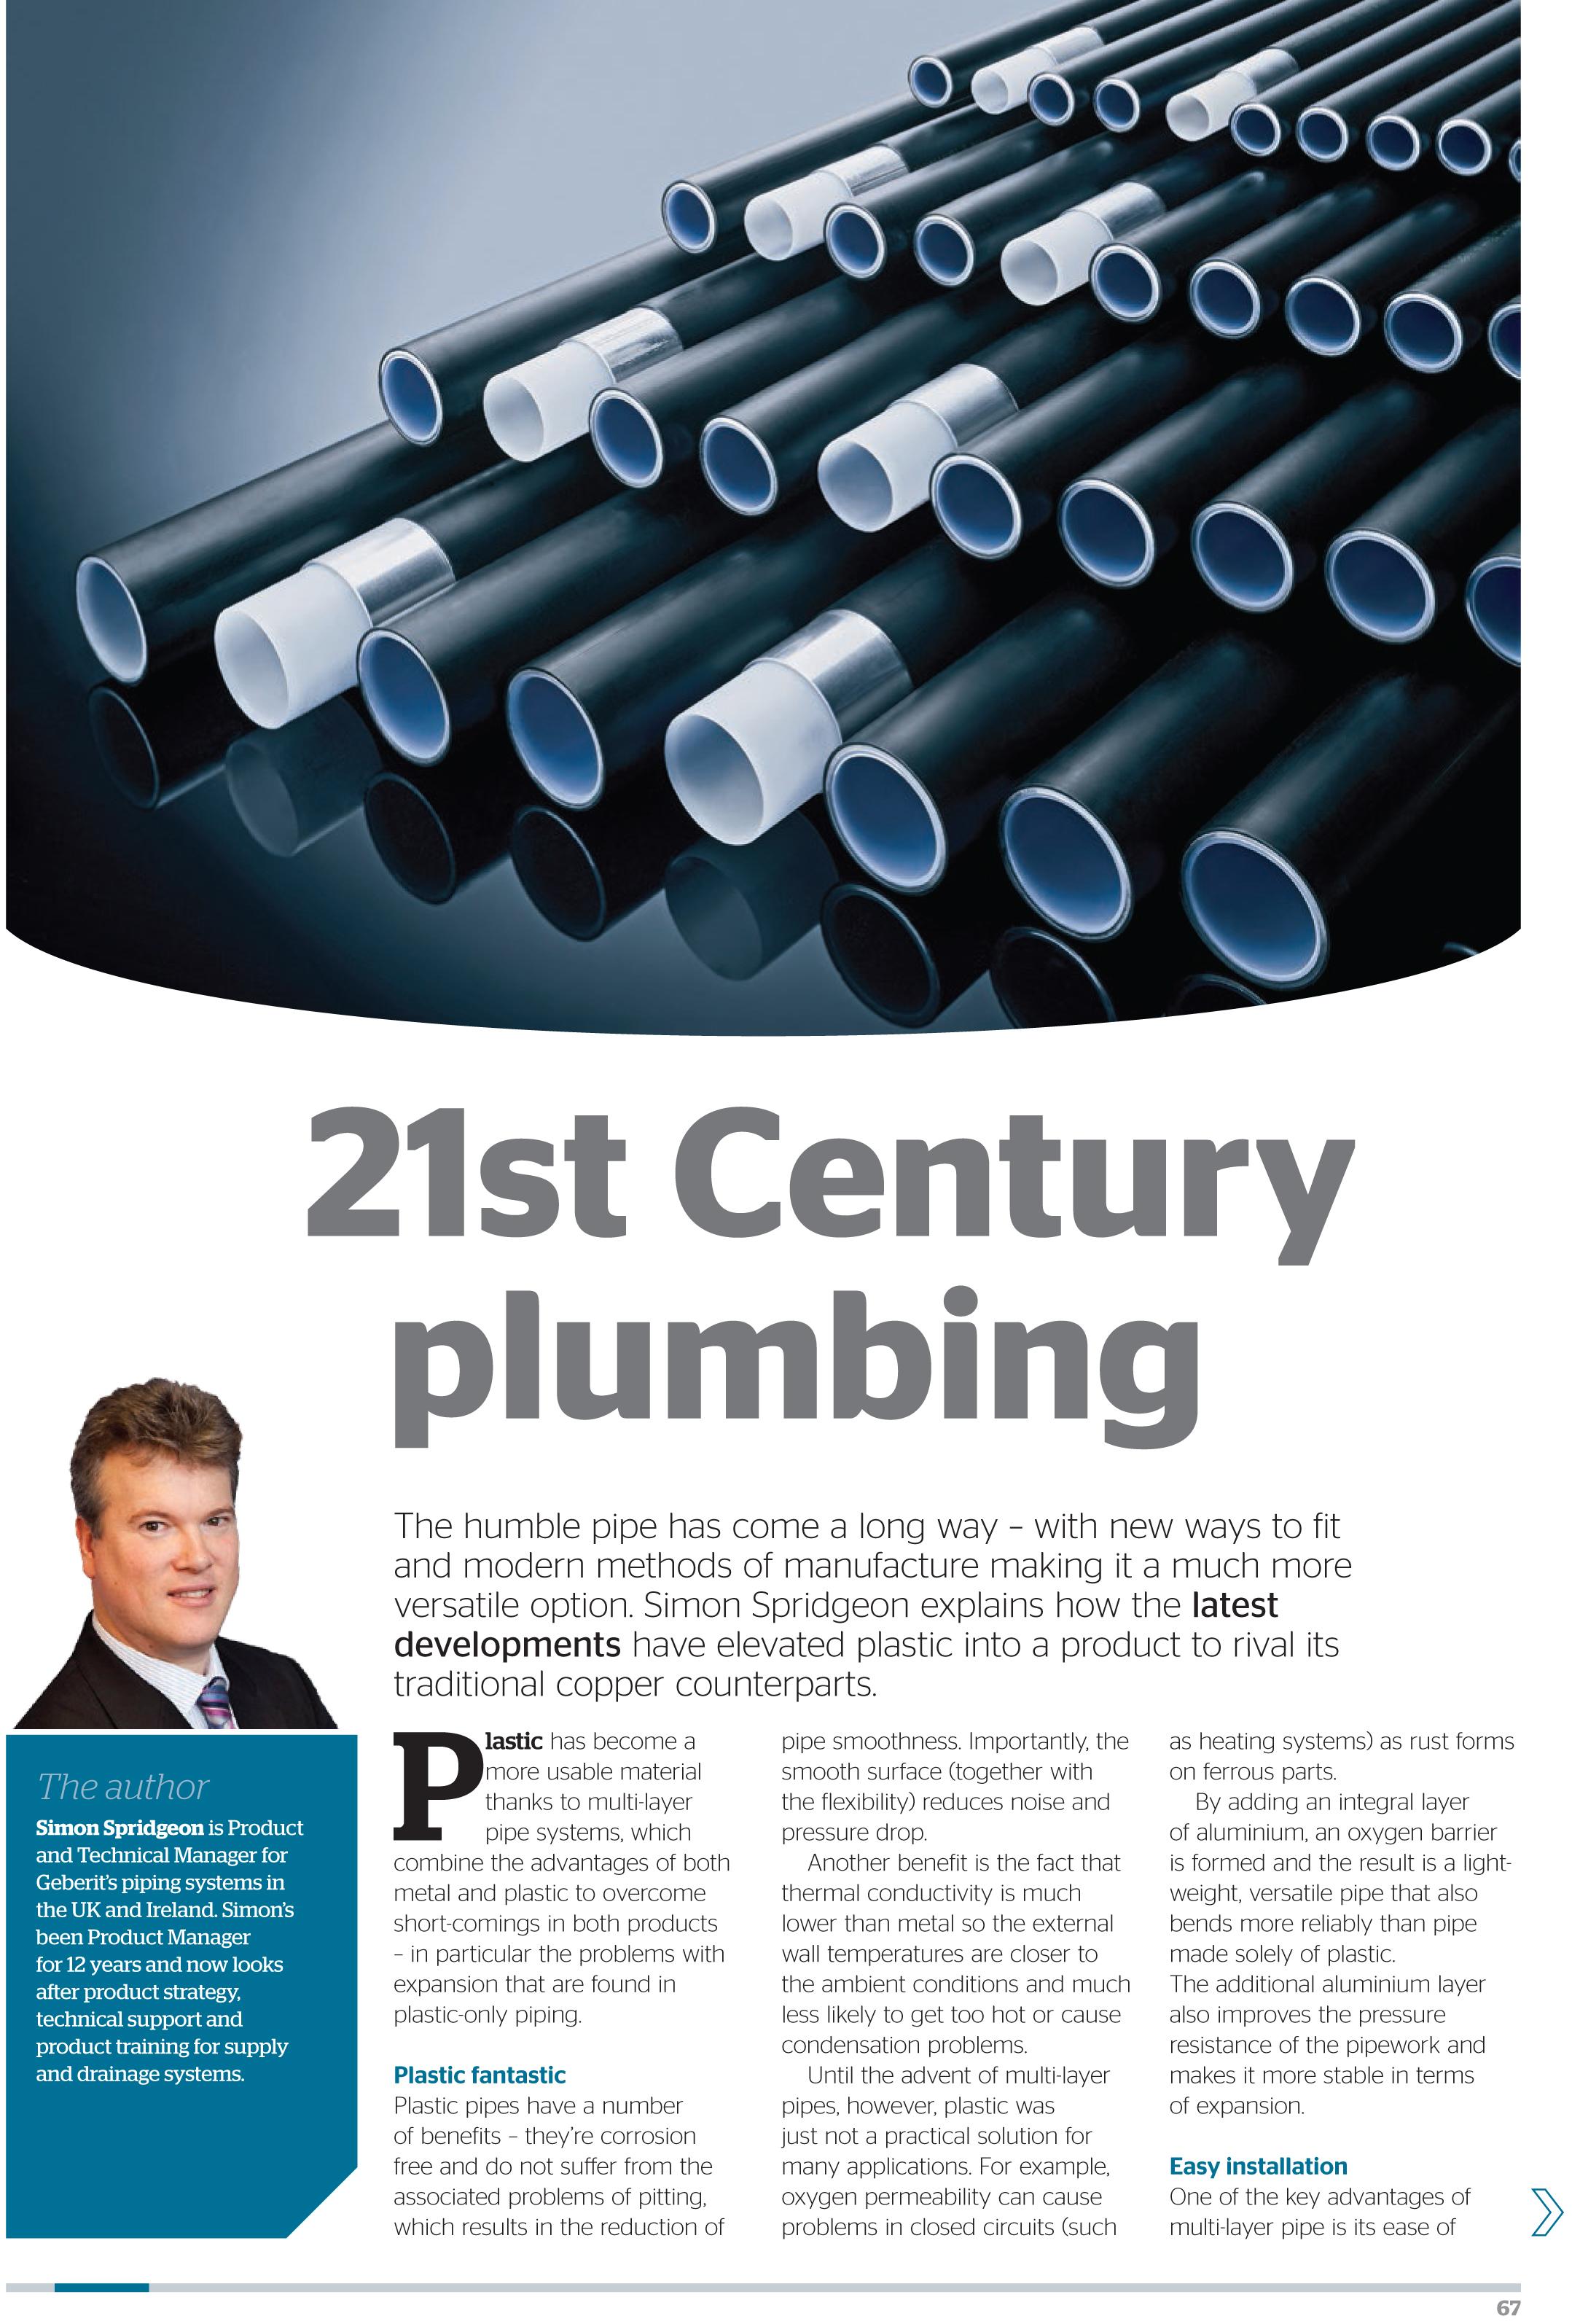 21st century plumbing-1